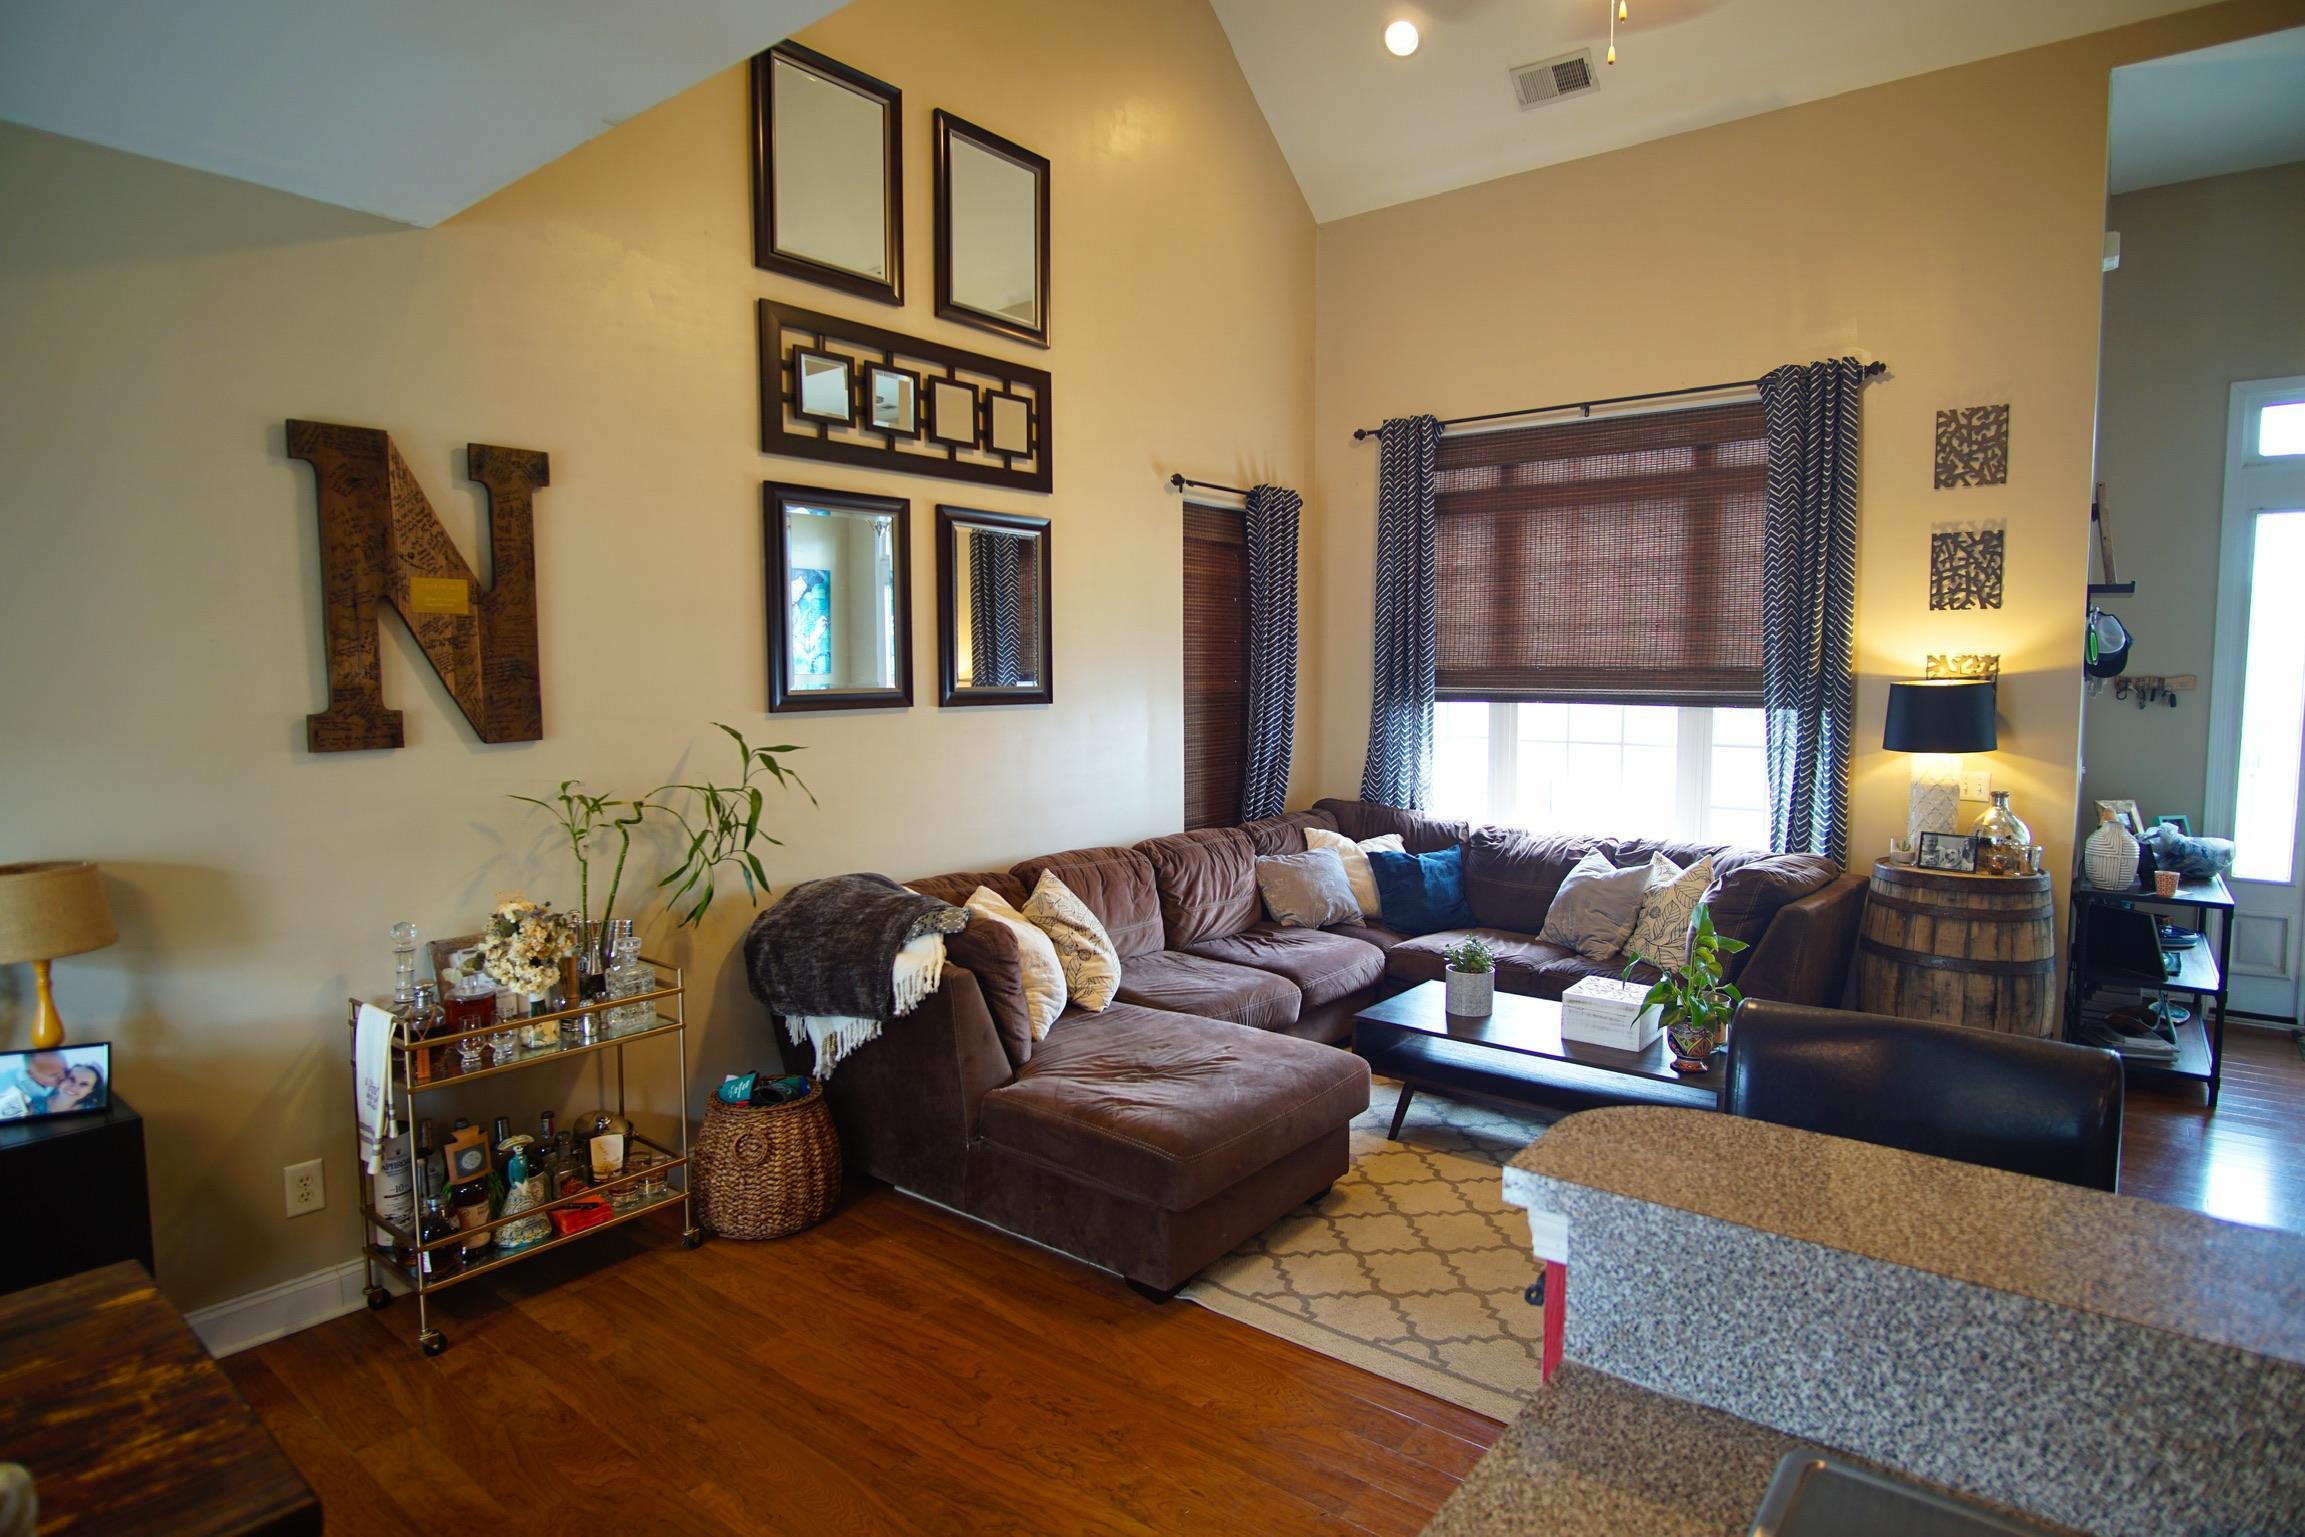 Colony North II Homes For Sale - 7828 Magellan, North Charleston, SC - 1